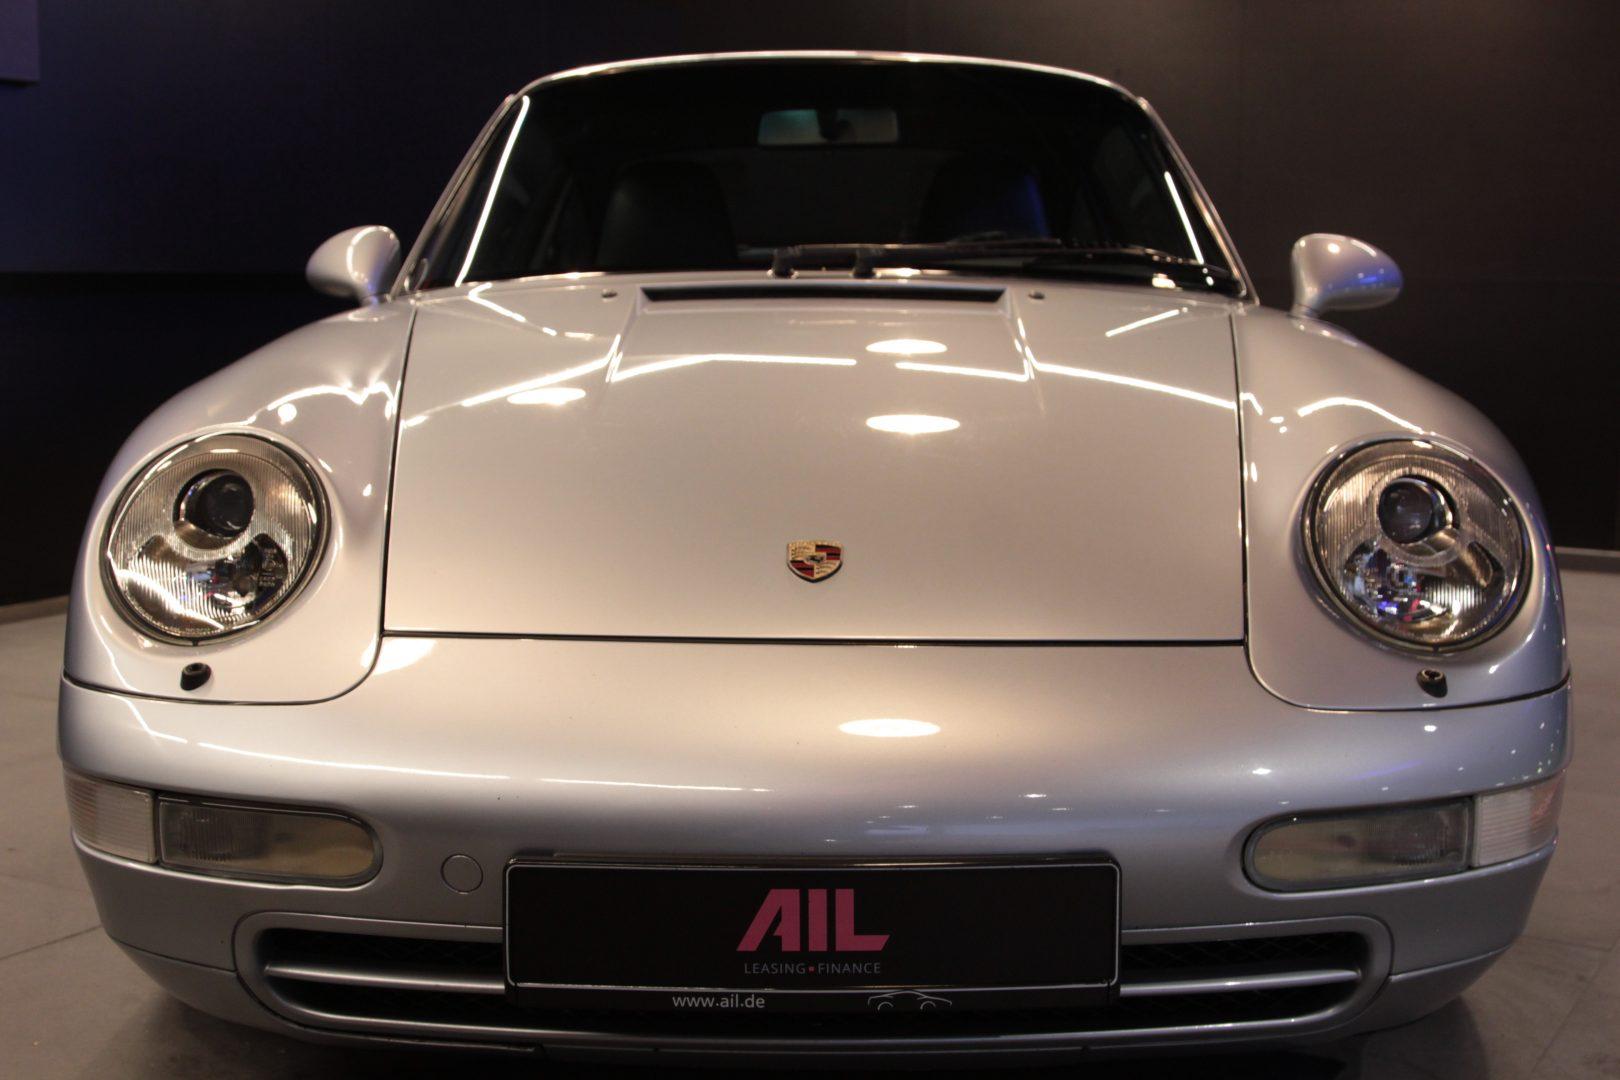 AIL Porsche 993 Carrera C2 3.6 Tiptronic 10